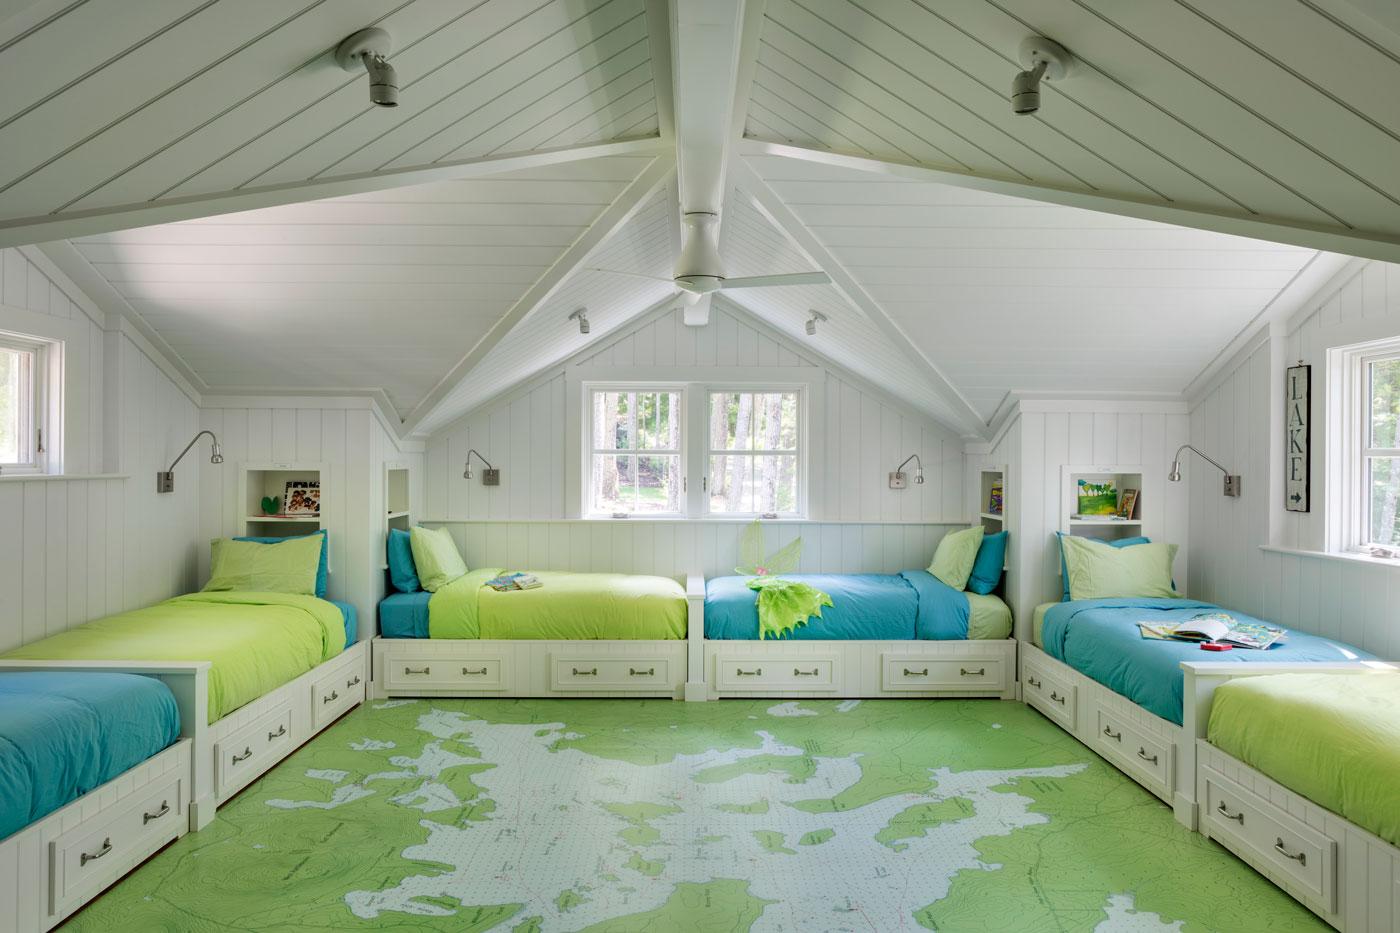 Colorul custom bunkroom designed by LDa Architecture & Interiors